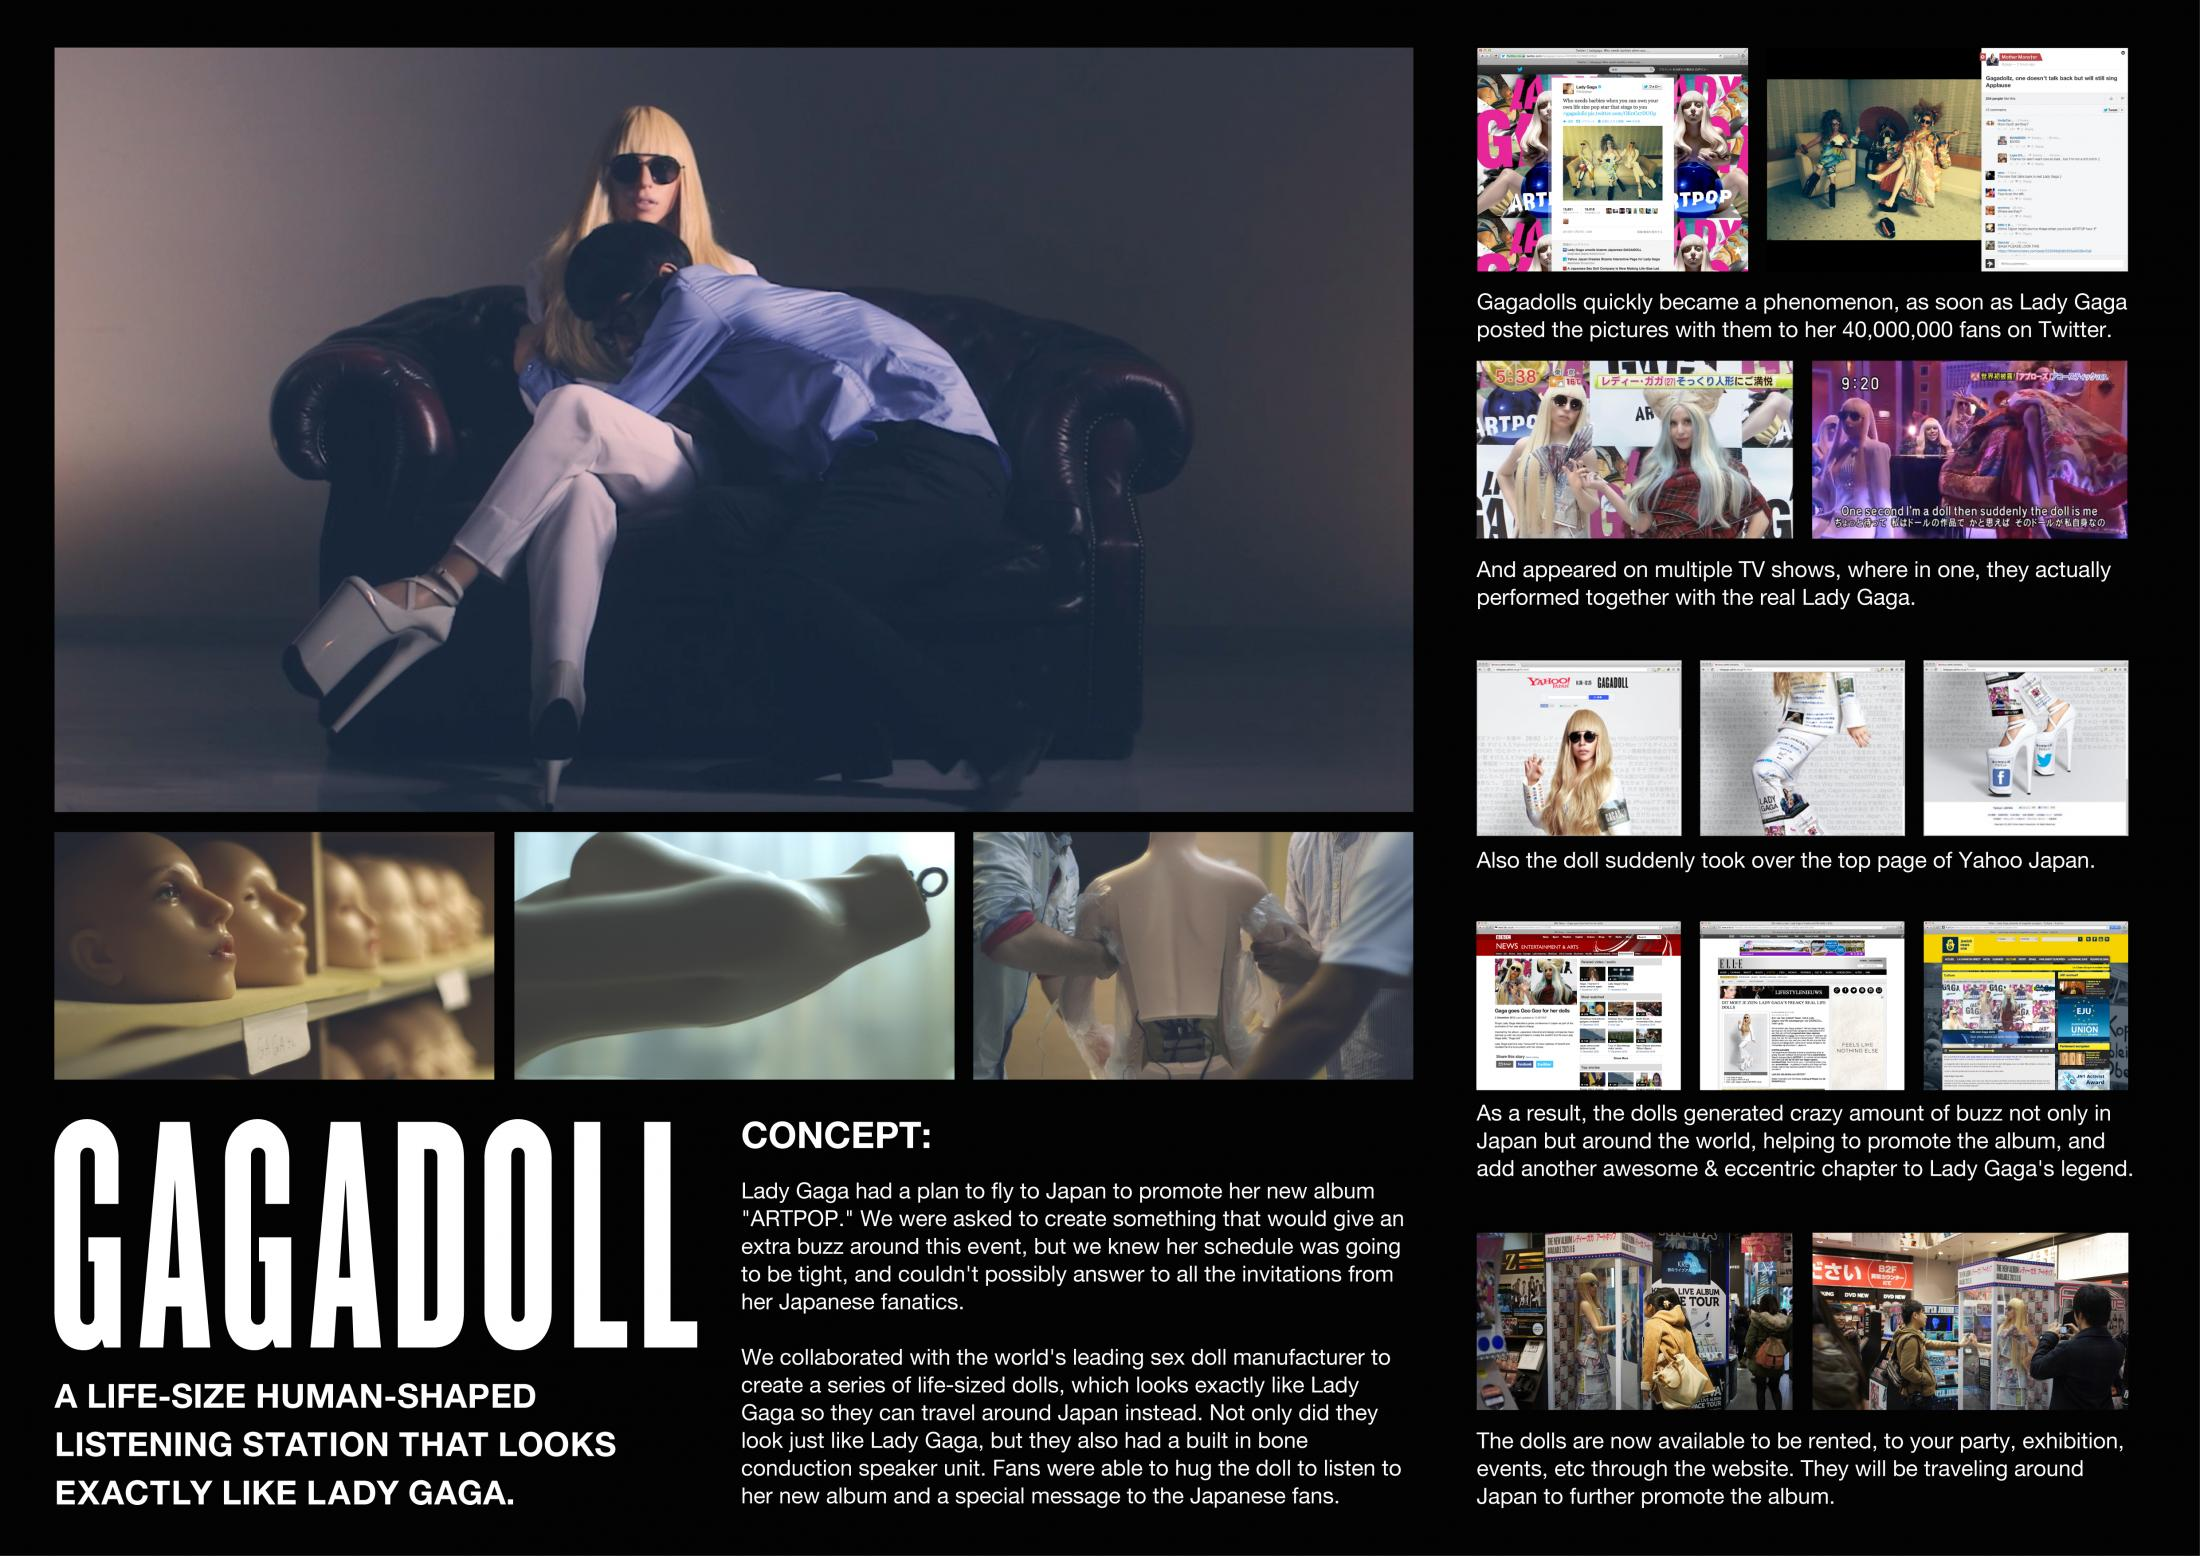 Thumbnail for GAGADOLL